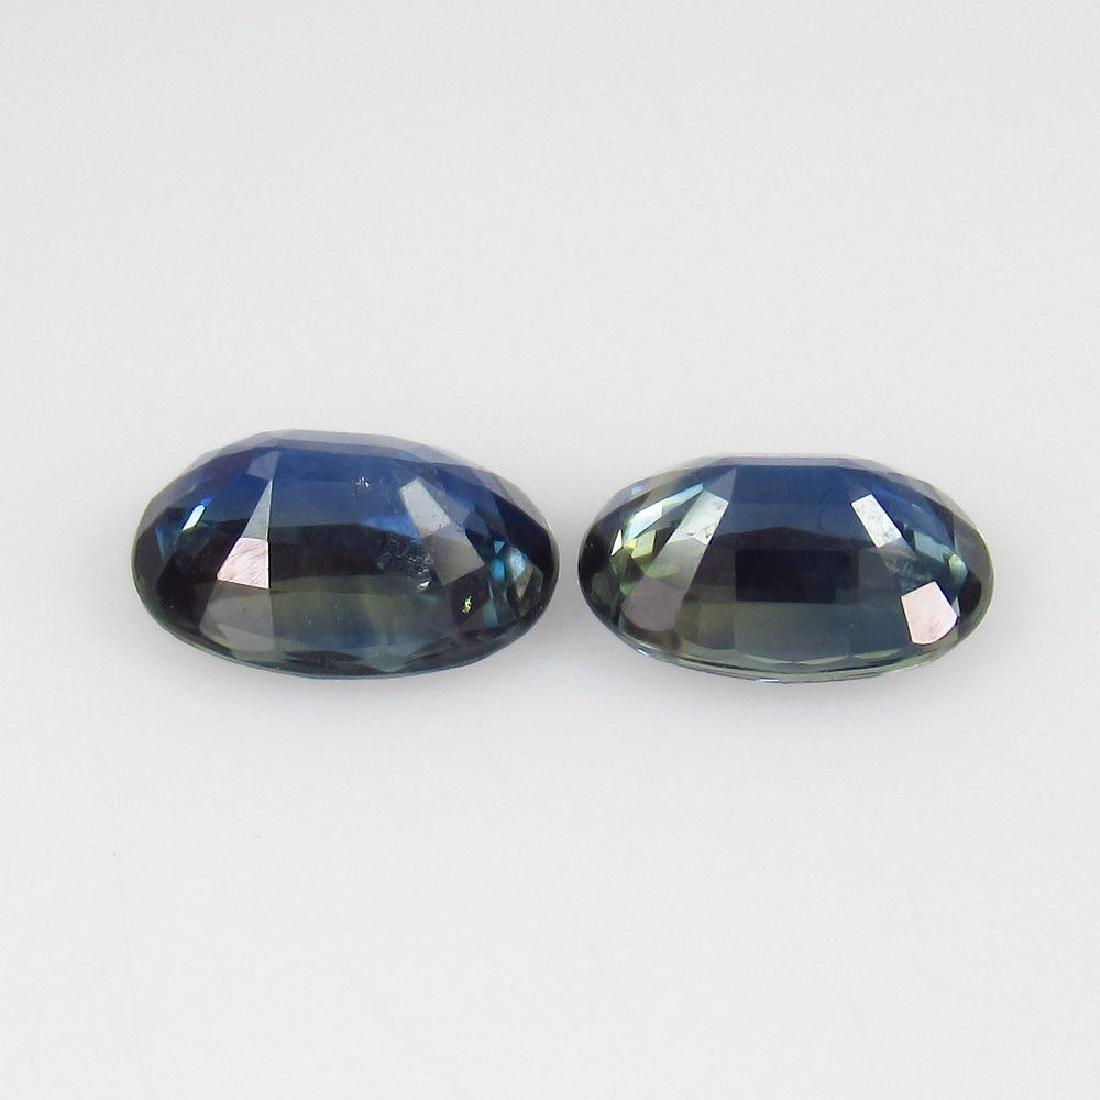 2.00 Ct Genuine Ceylon Deep Vivid Blue Sapphire - 2